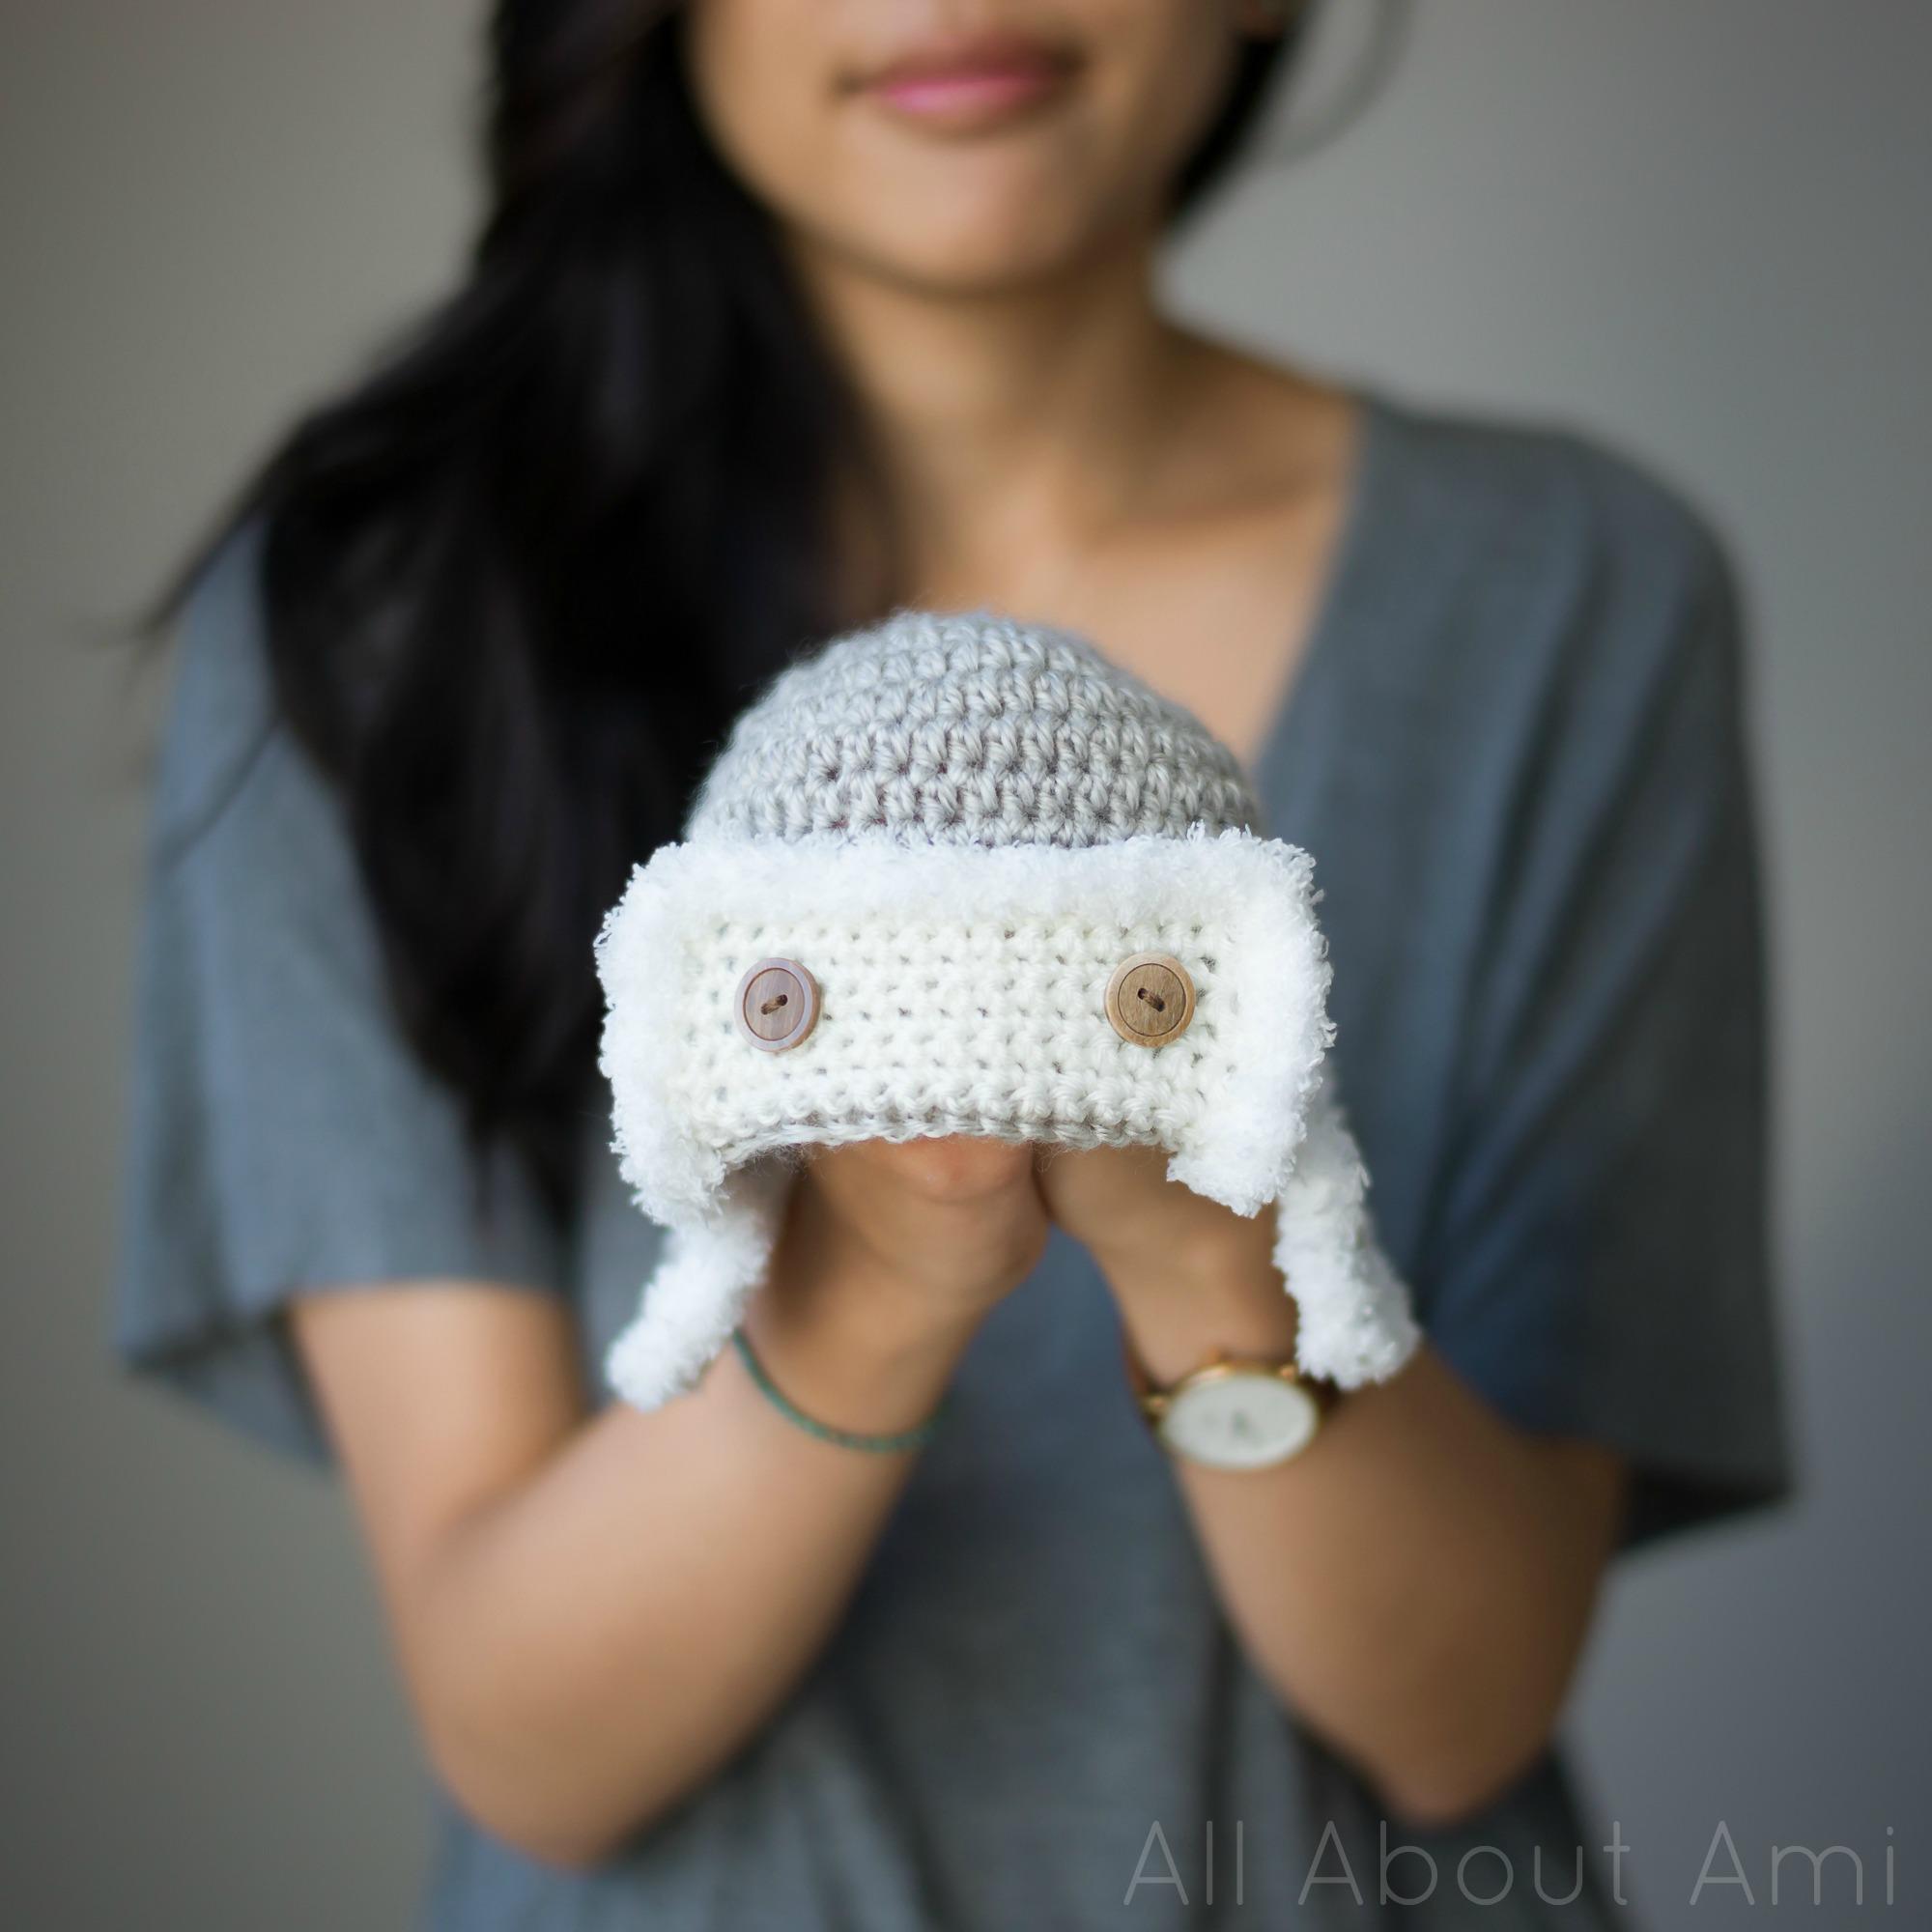 Child Crochet Aviator Hat Pattern : Baby Aviator Hat - All About Ami